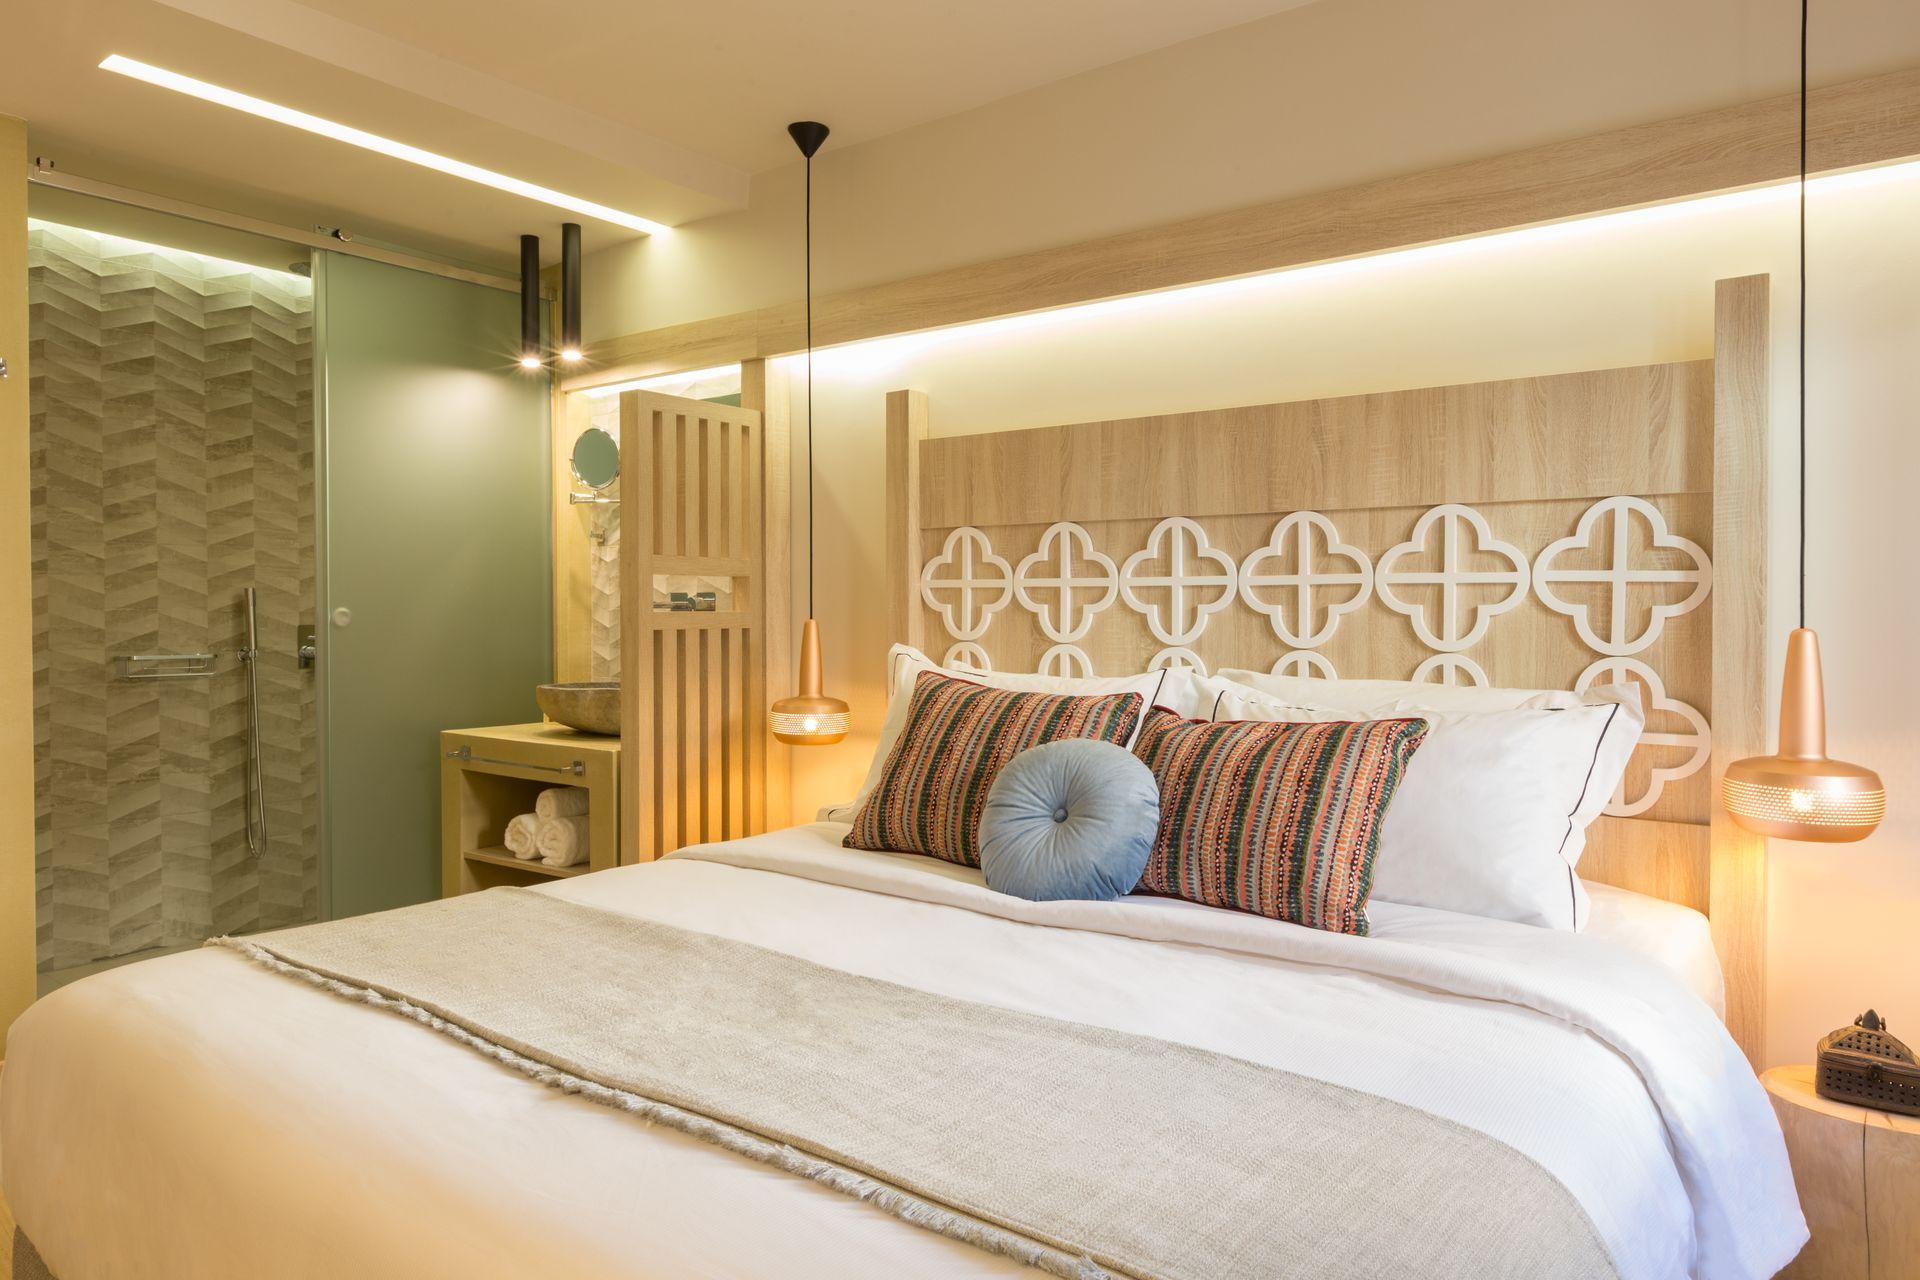 Cressa Suites - Ρέθυμνο, Κρήτη ✦ 2 Ημέρες (1 Διανυκτέρευση) ✦ 2 άτομα ✦ Πρωινό ✦ 01/09/2021 έως 30/09/2021 ✦ Κοντά σε παραλία!